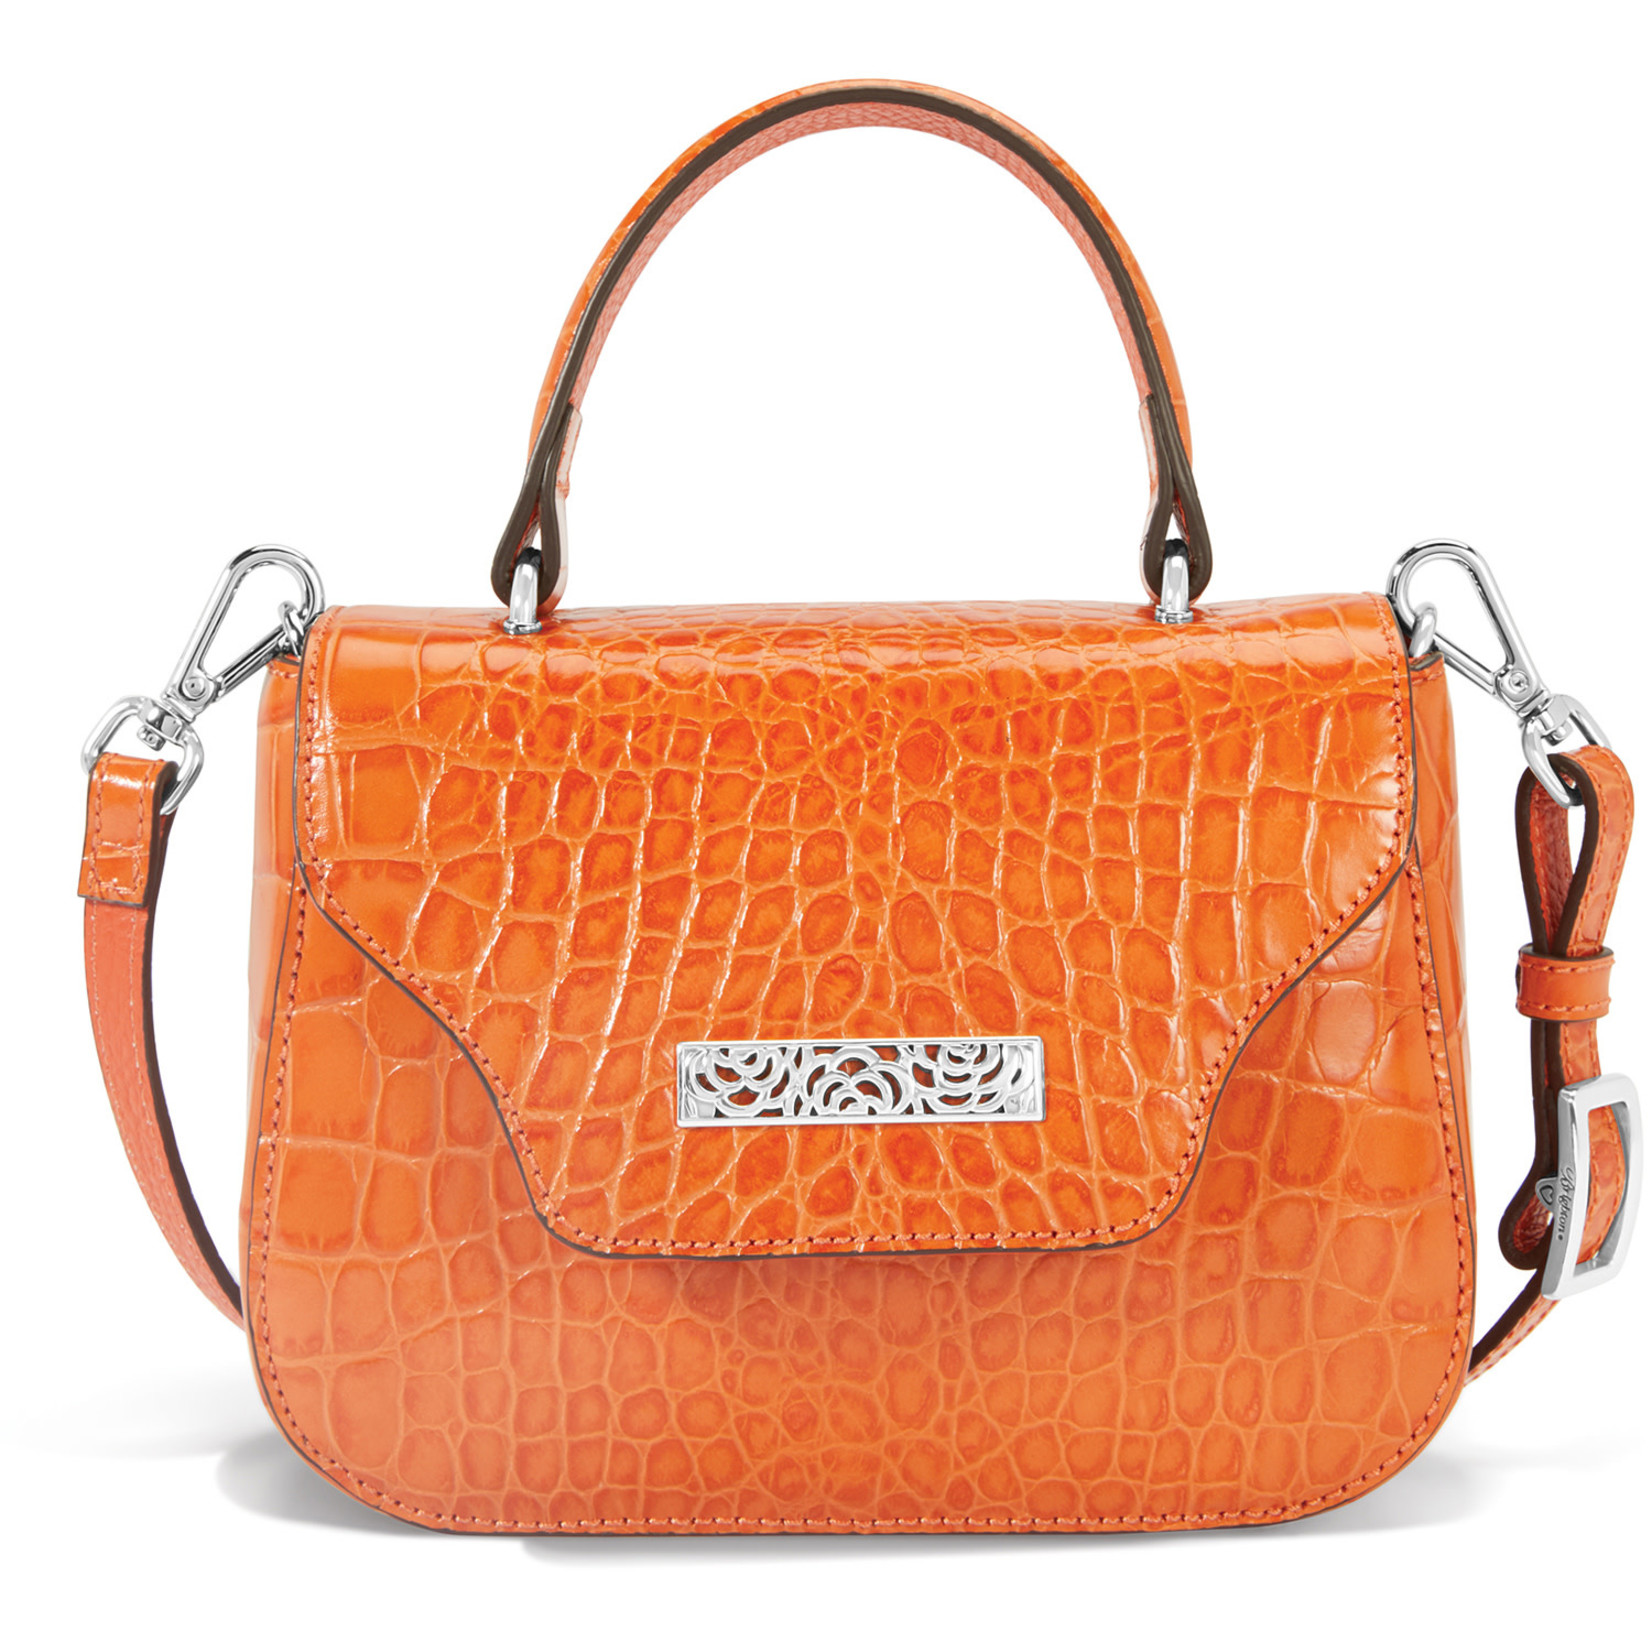 Brighton Avery Mini Flap Bag